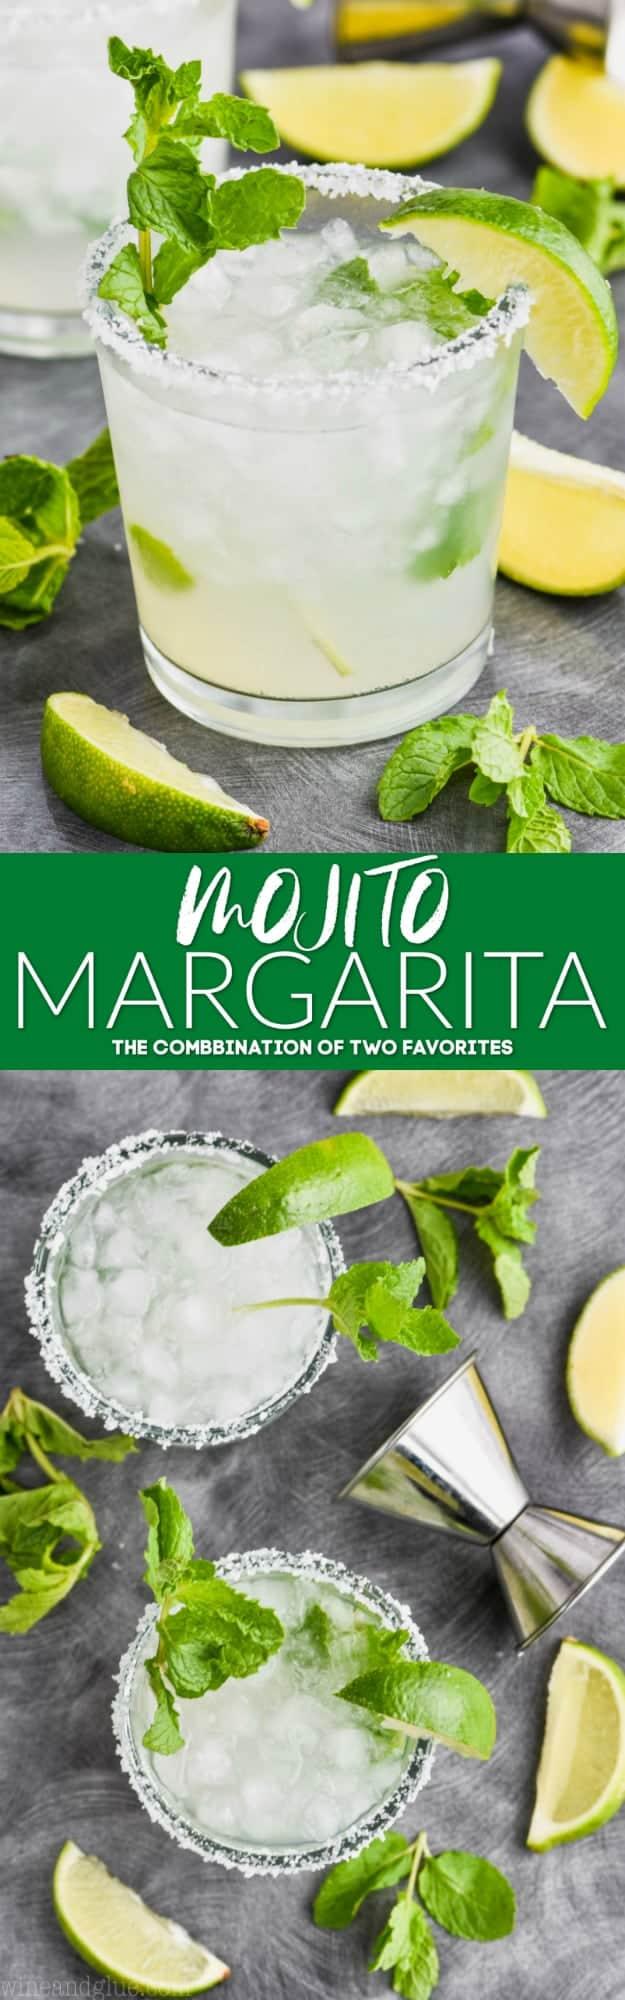 collage of photos of mojito margarita